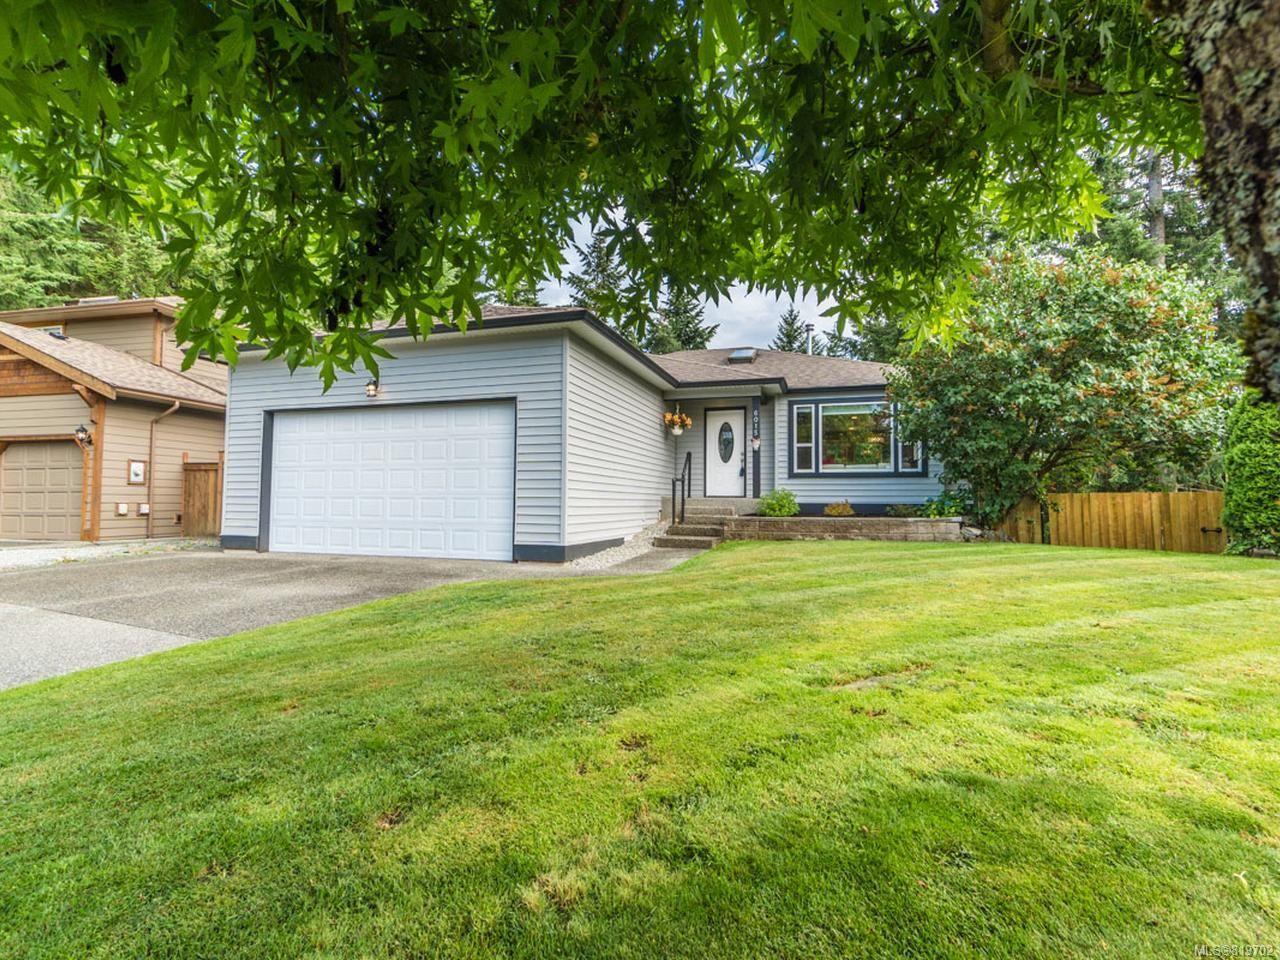 Main Photo: 6015 JOSEPH PLACE in NANAIMO: Na Pleasant Valley House for sale (Nanaimo)  : MLS®# 819702